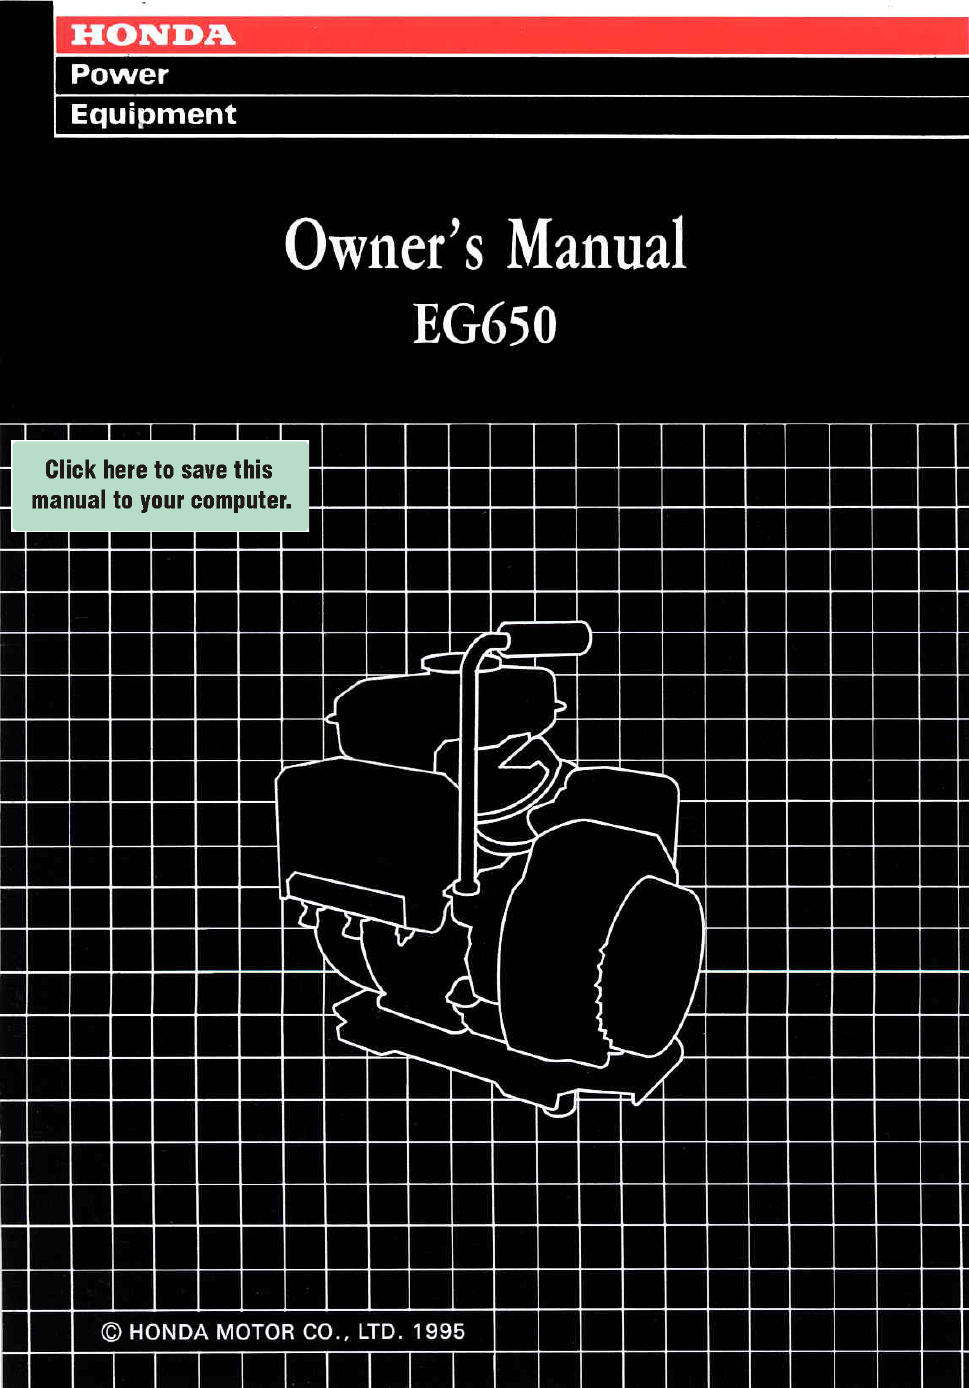 Honda Eg 650 Manual Toyota Corolla Radio Wiring Diagram As Well Metra 70 2105 Chevy Impala Array Eg650 Owner U0027s Free Pdf Download 44 Pages Rh Manualagent Com